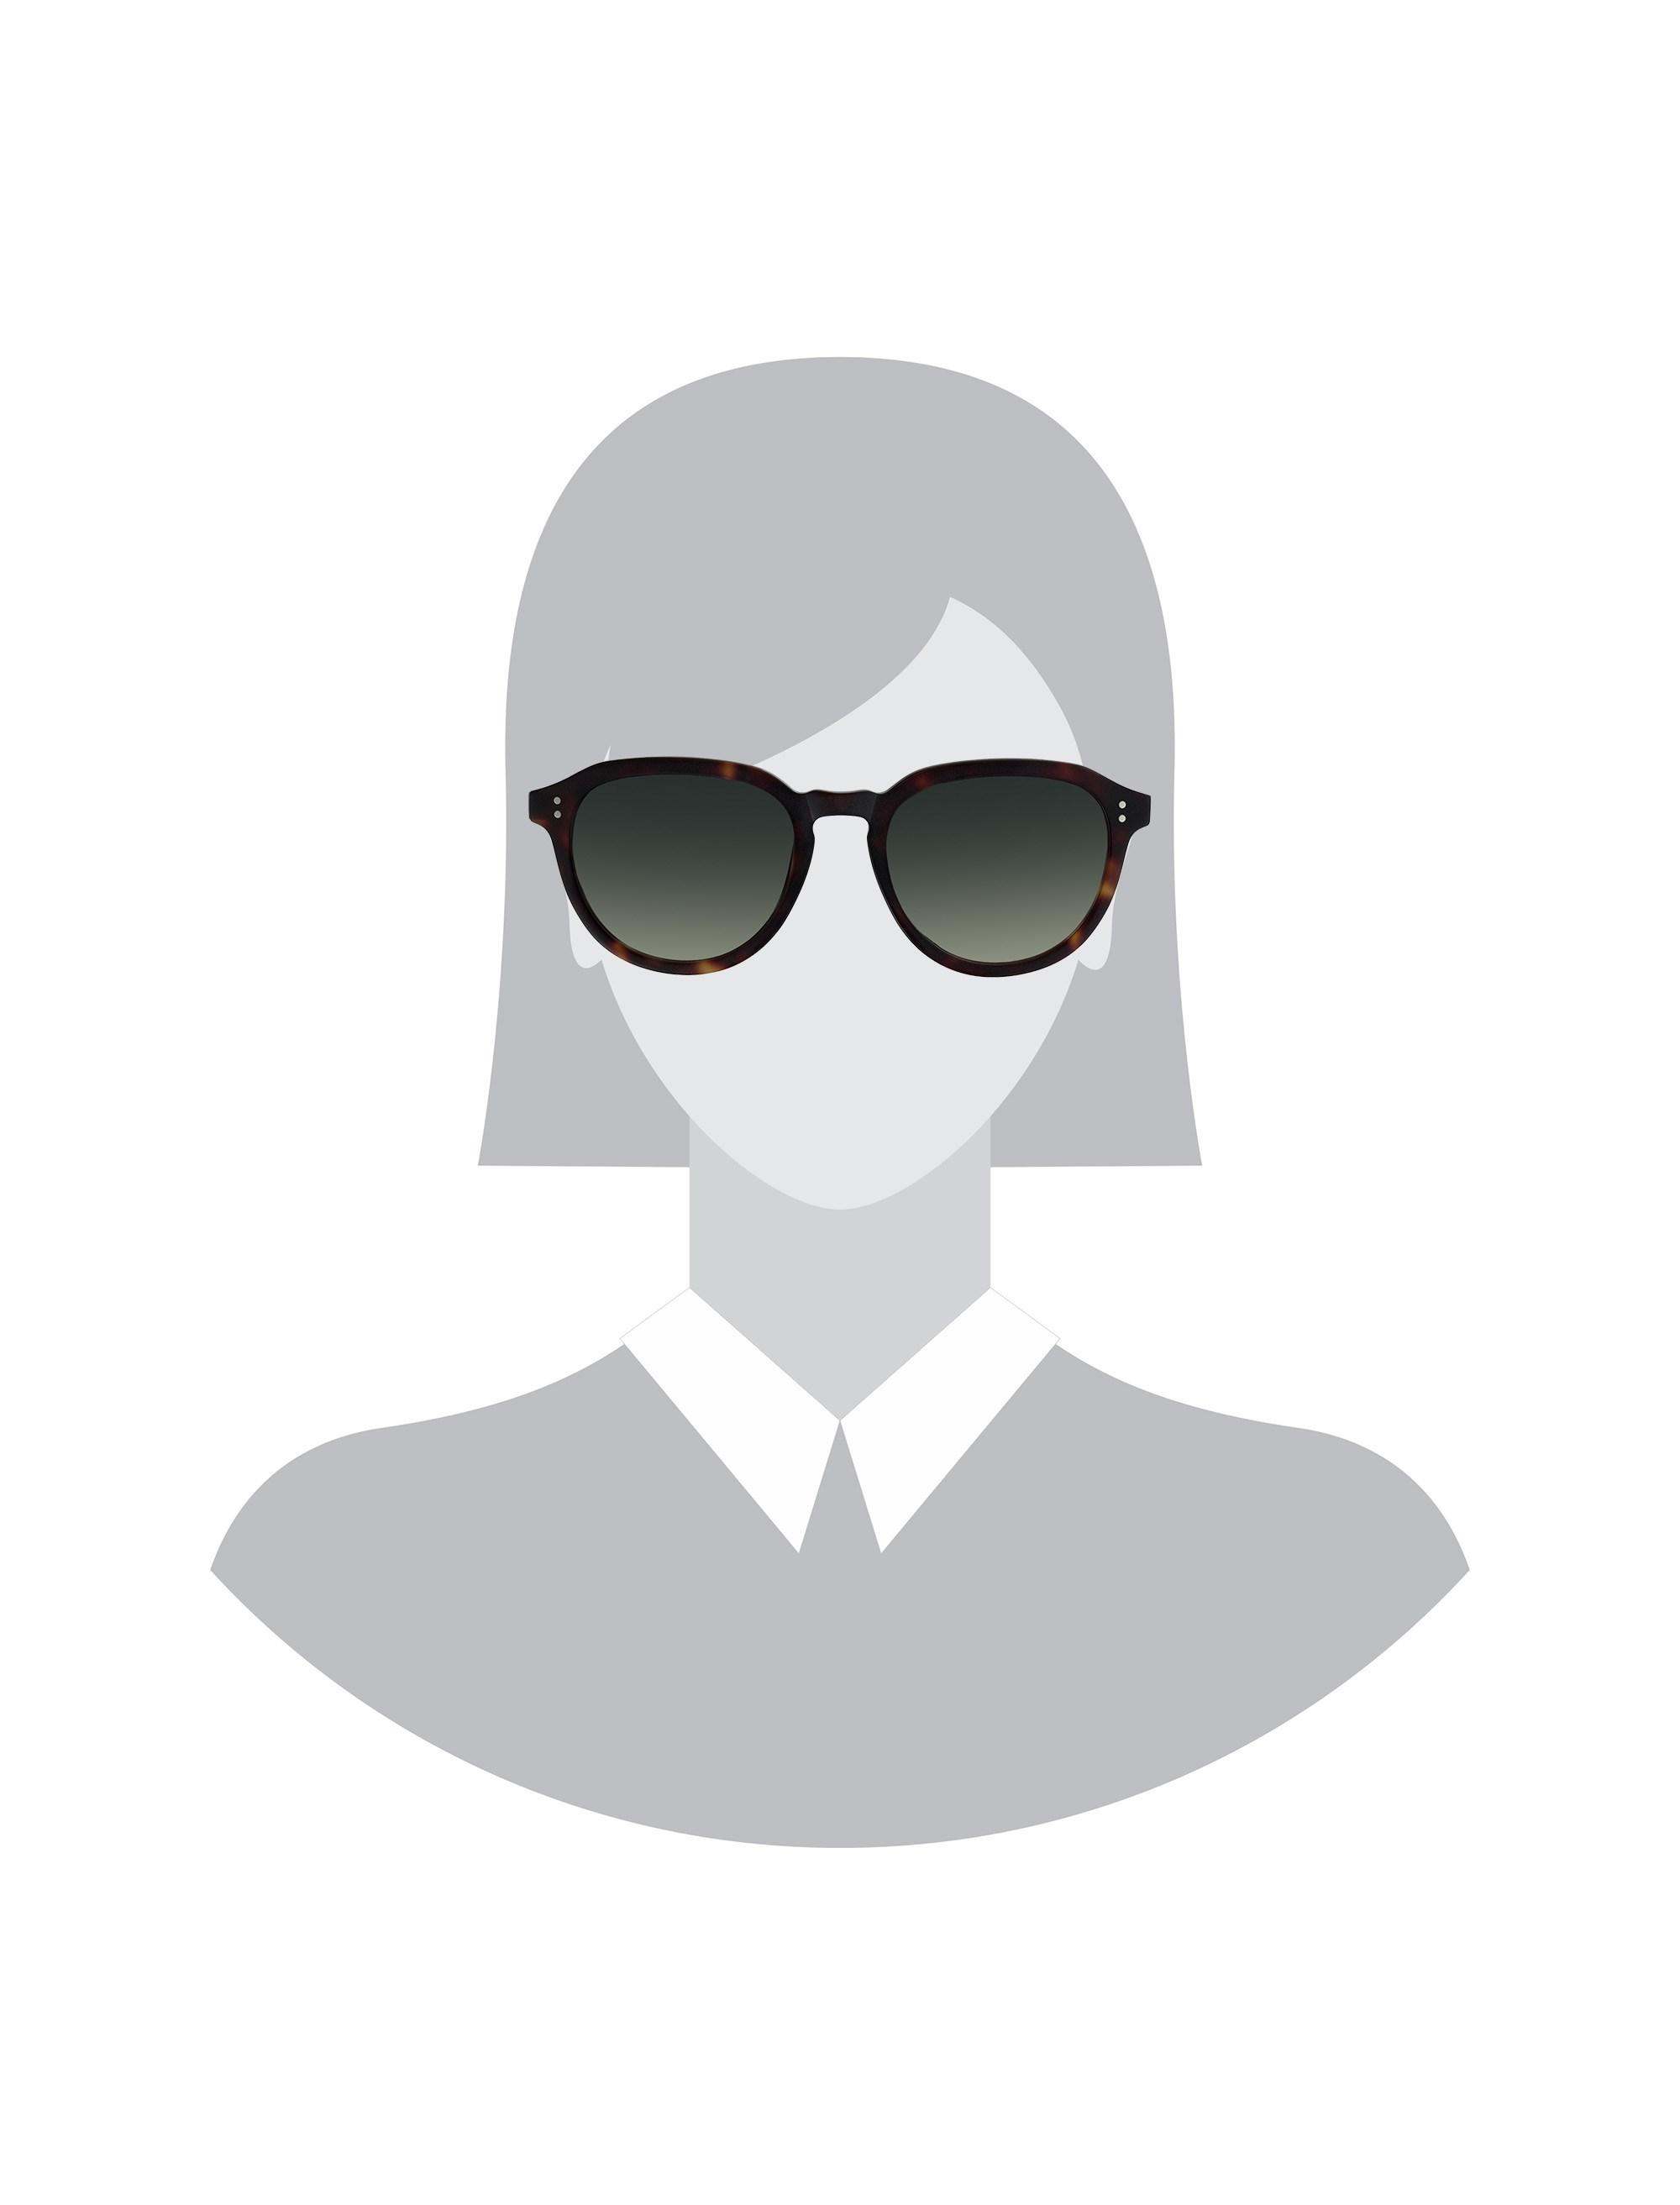 عینک آفتابی پنتوس زنانه - هکت - قهوه اي    - 4